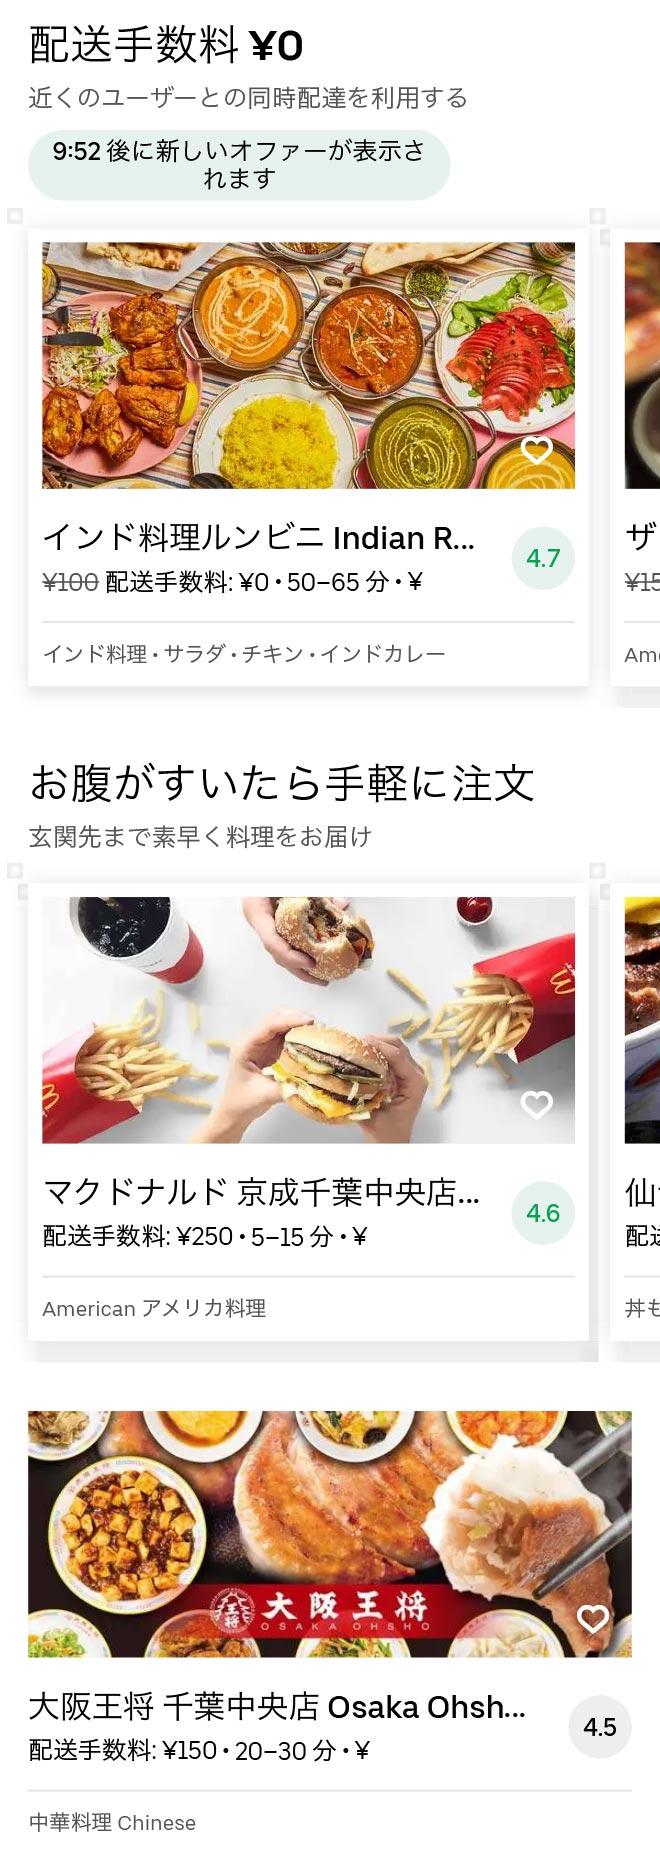 Chiba menu 2010 01